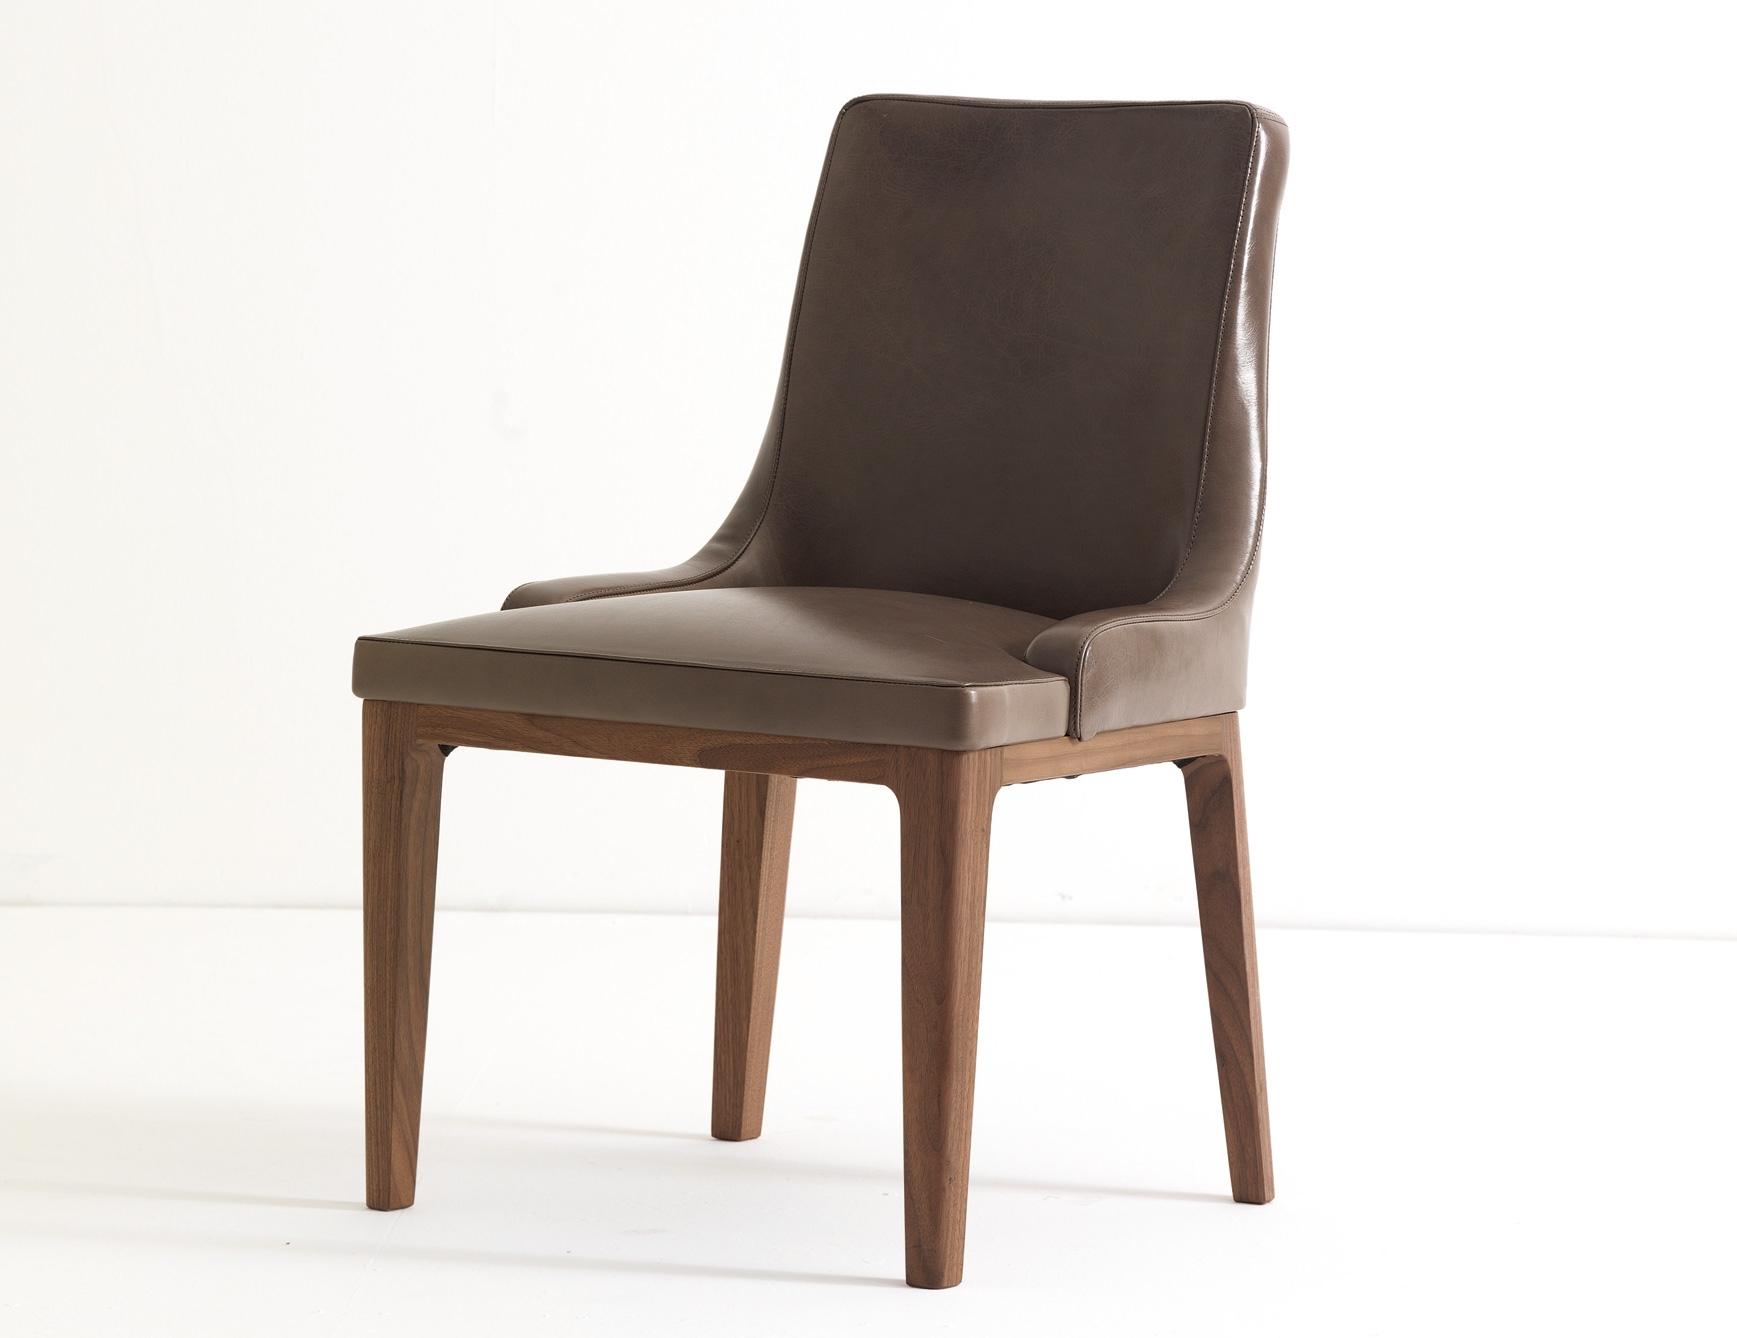 Nella Vetrina Regarding Lola Side Chairs (#13 of 20)